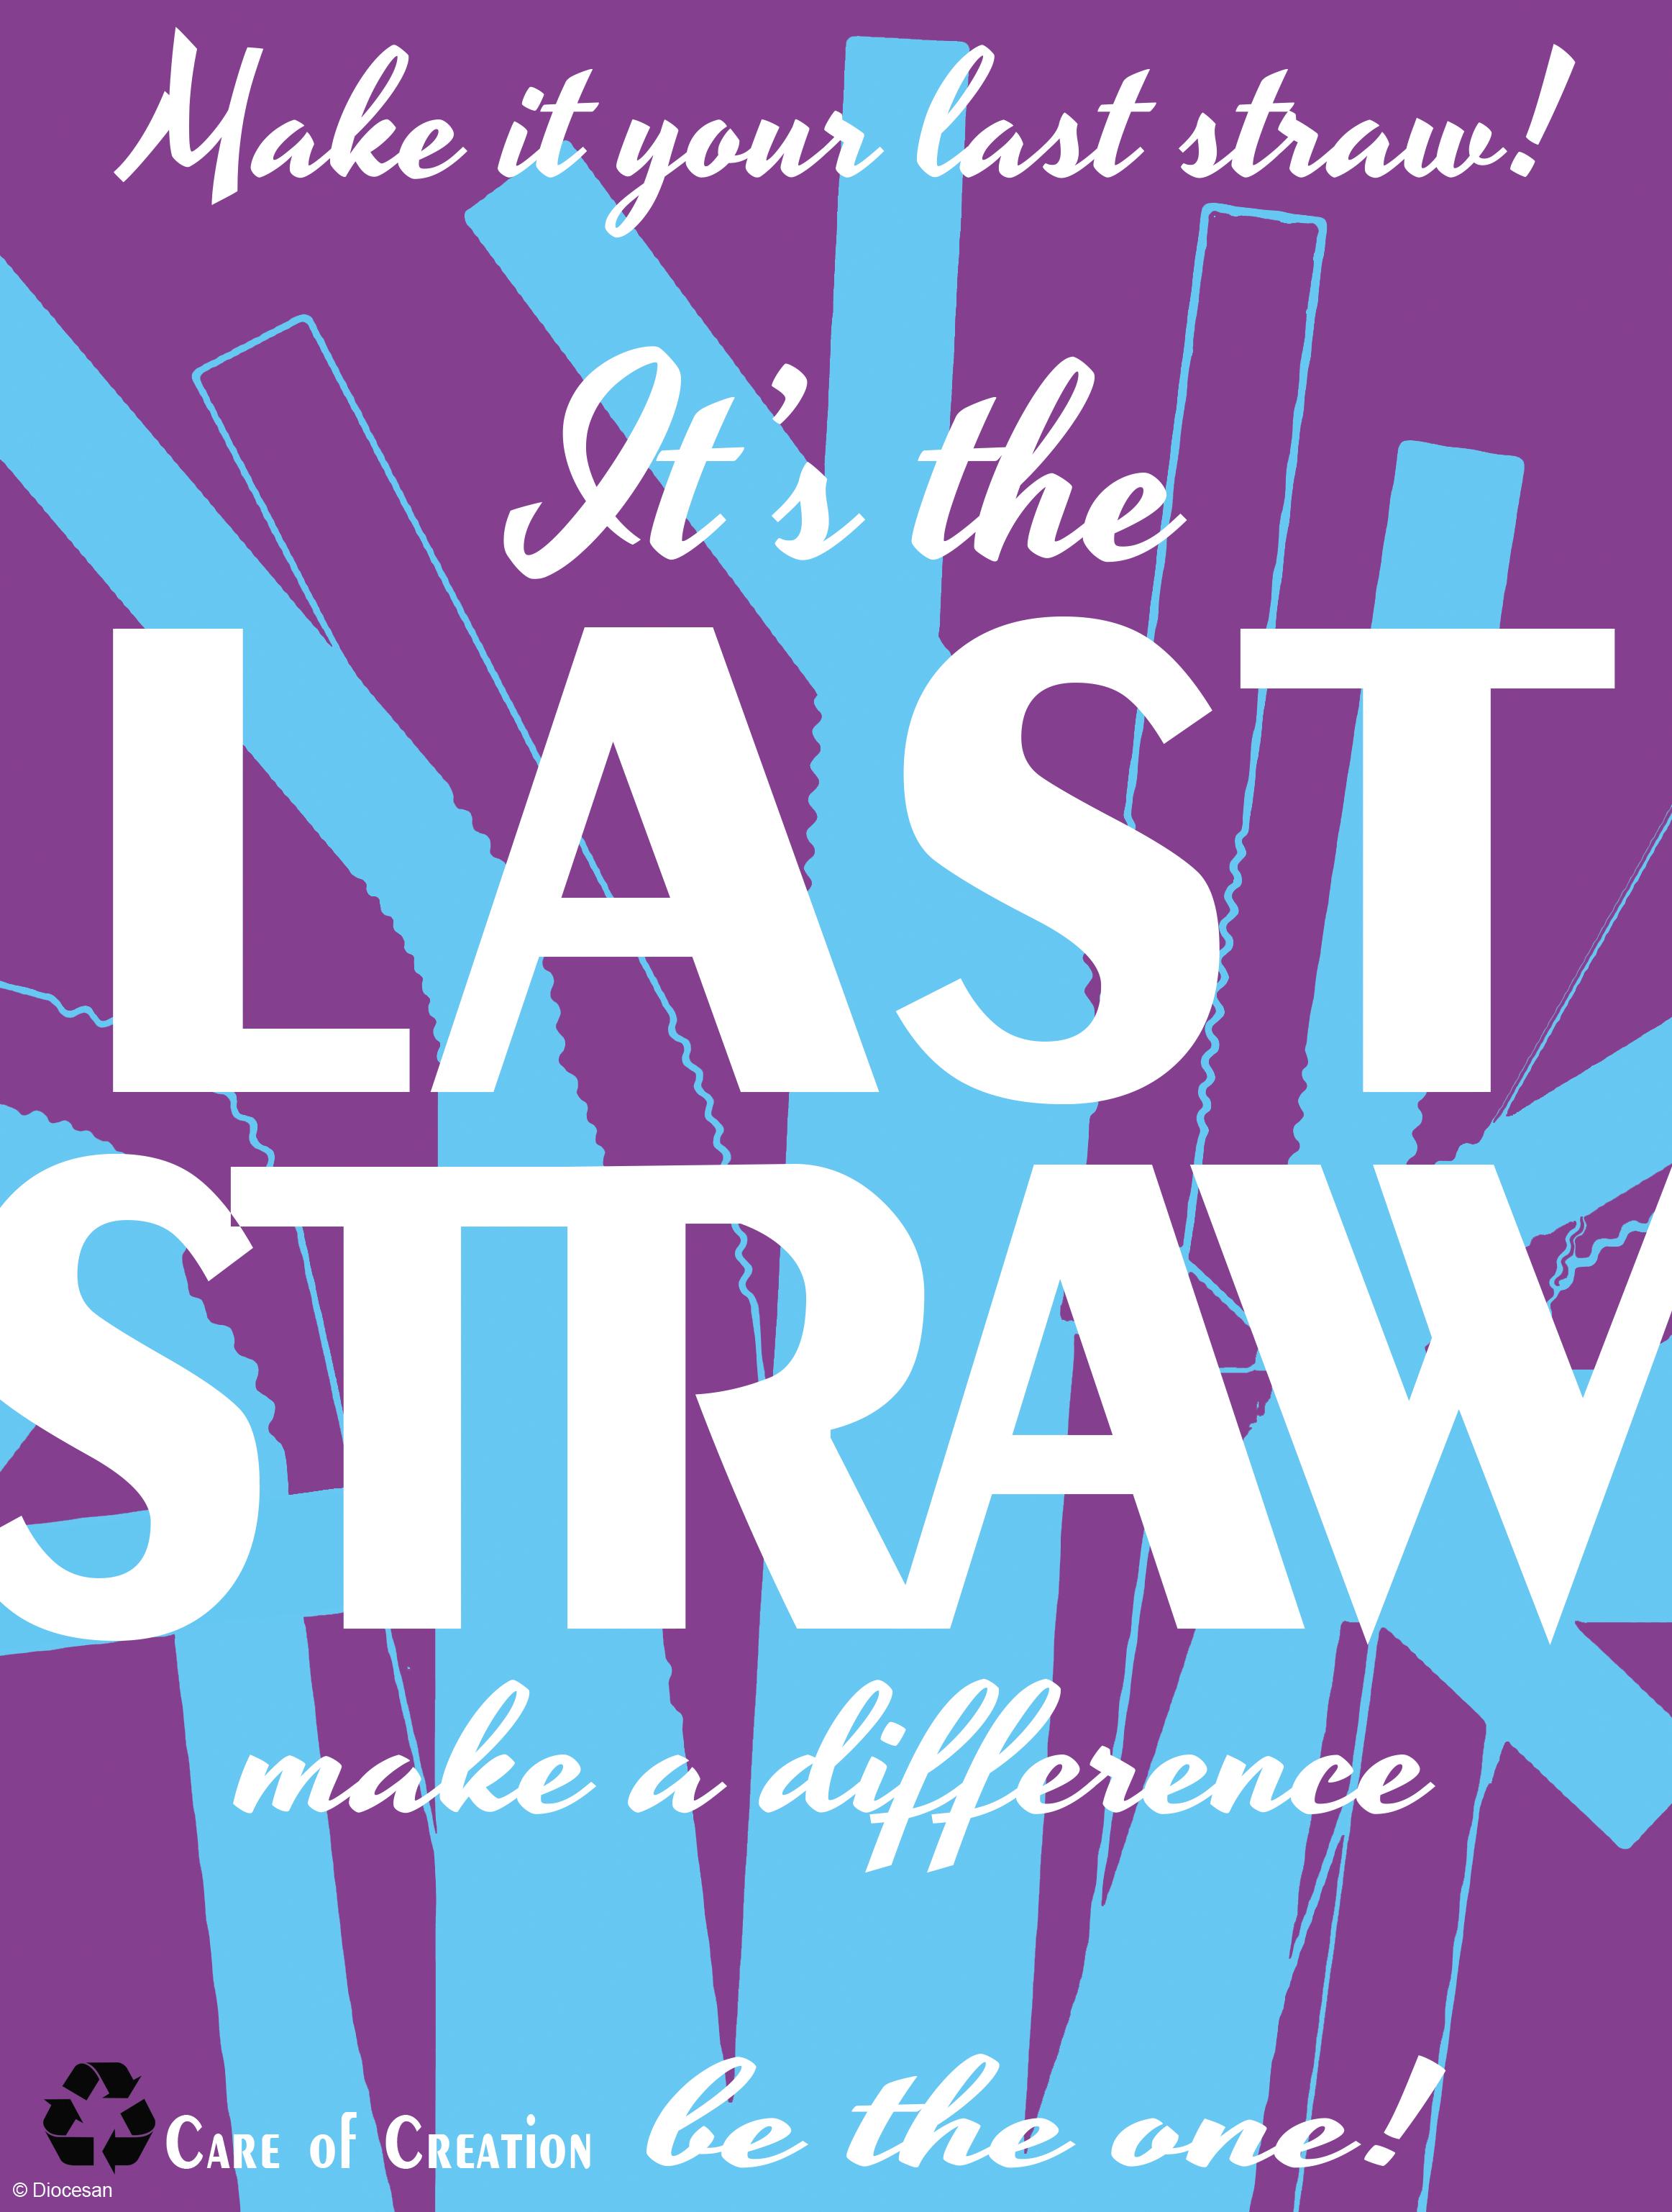 Care of Creation - Last Straw